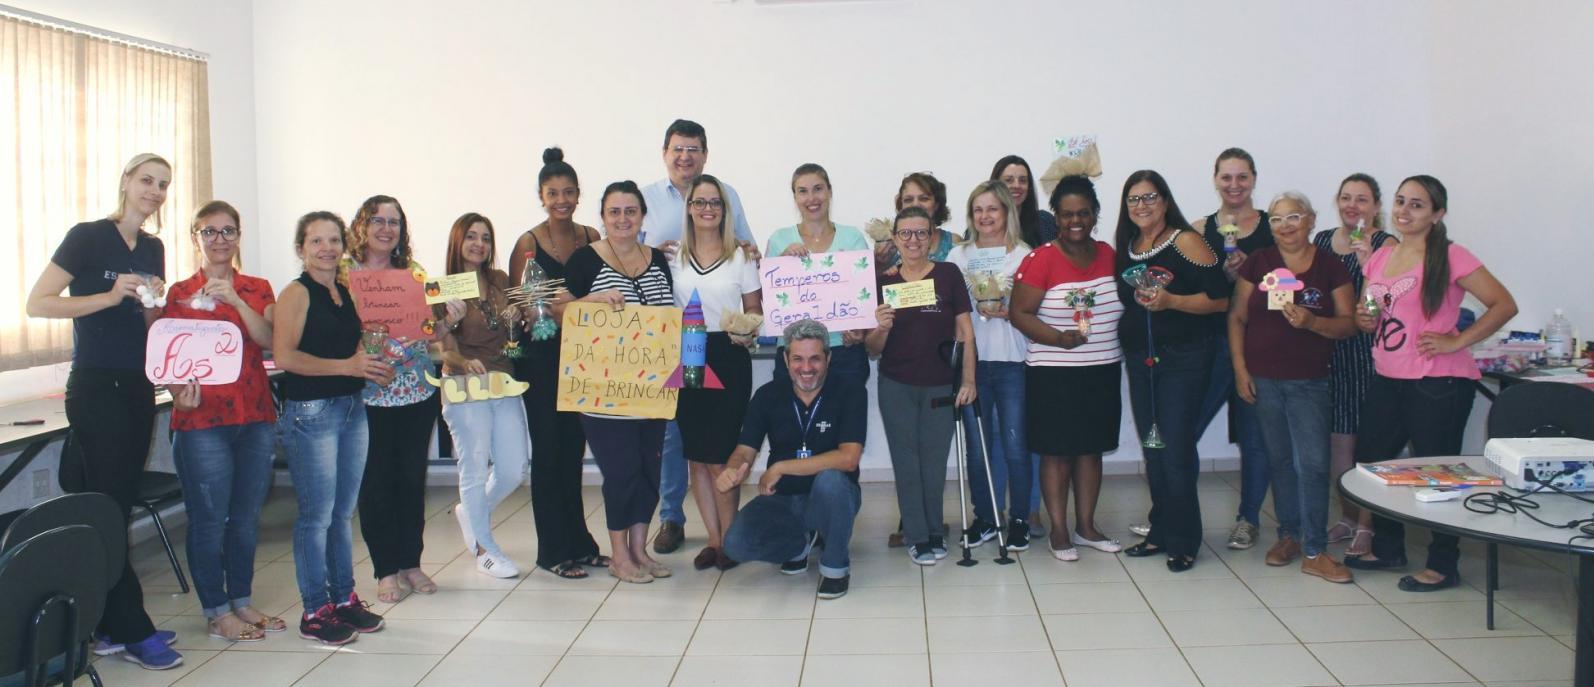 Projeto do SEBRAE ensina noções de empreendedorismo aos alunos de Cordeirópolis